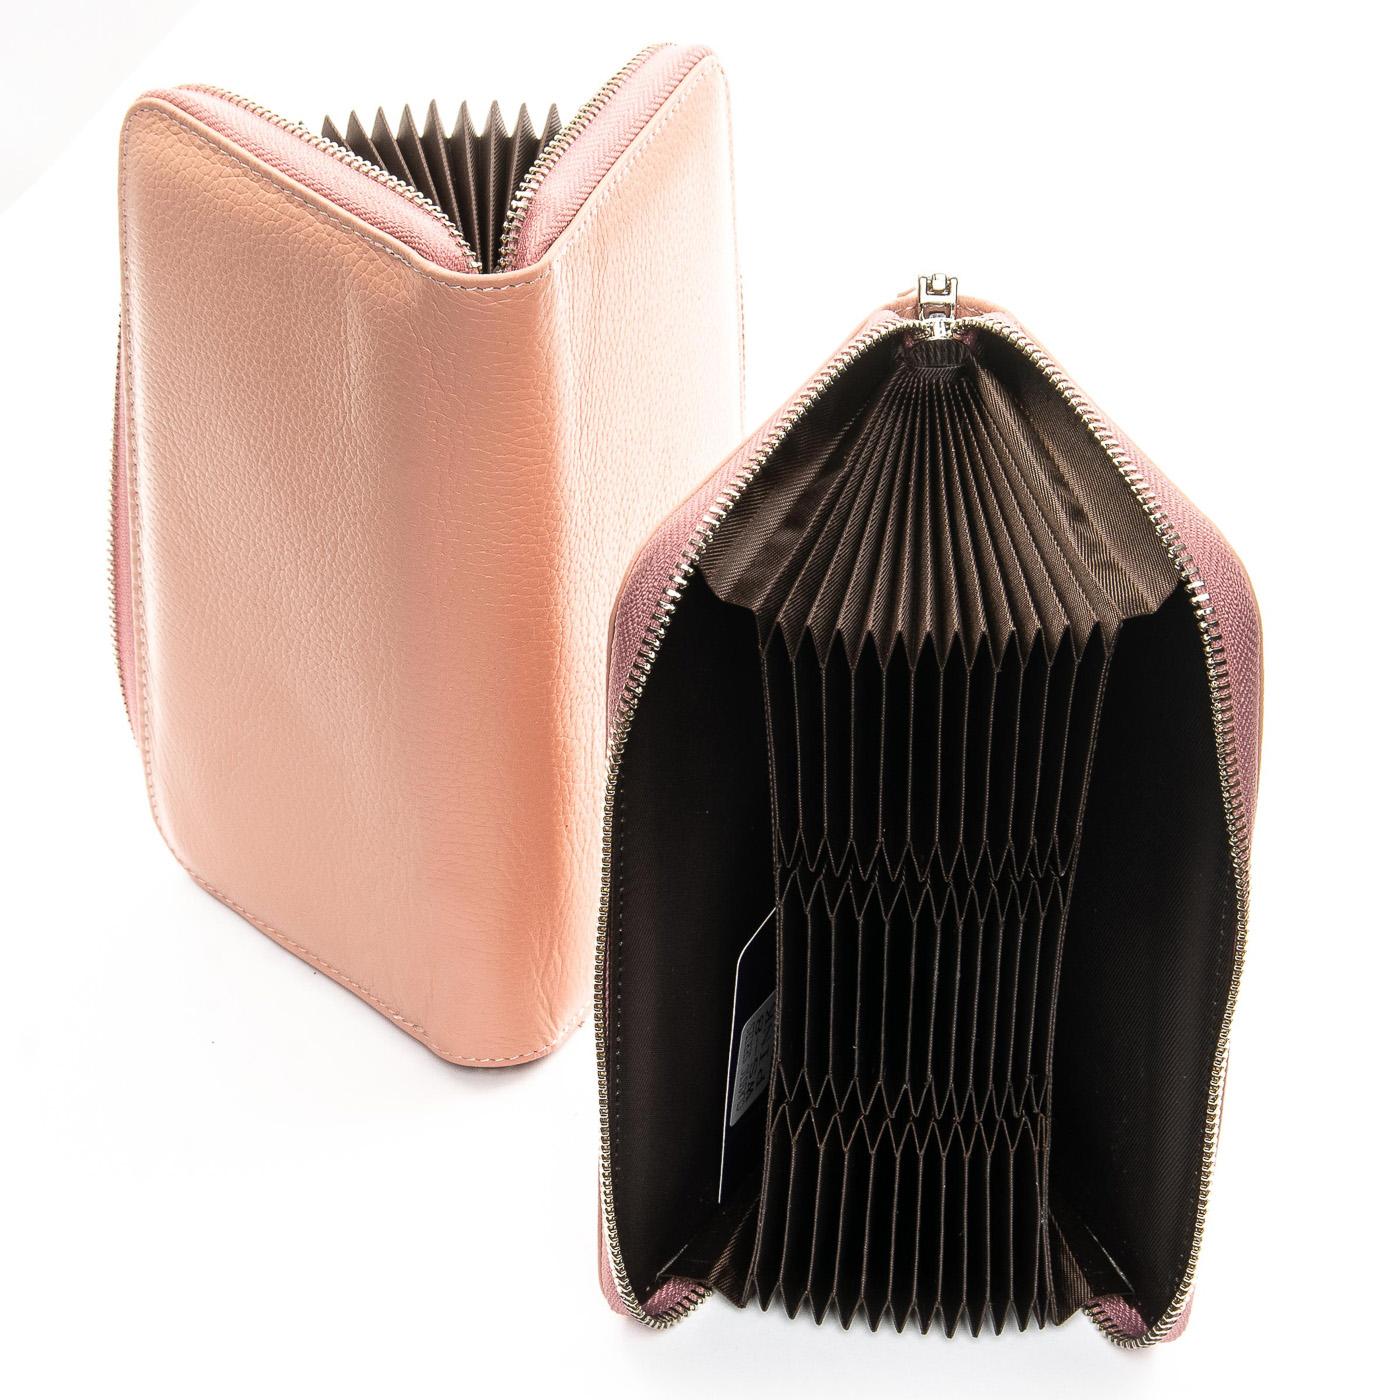 Кошелек Classic кожа DR. BOND WS-8 pink - фото 4